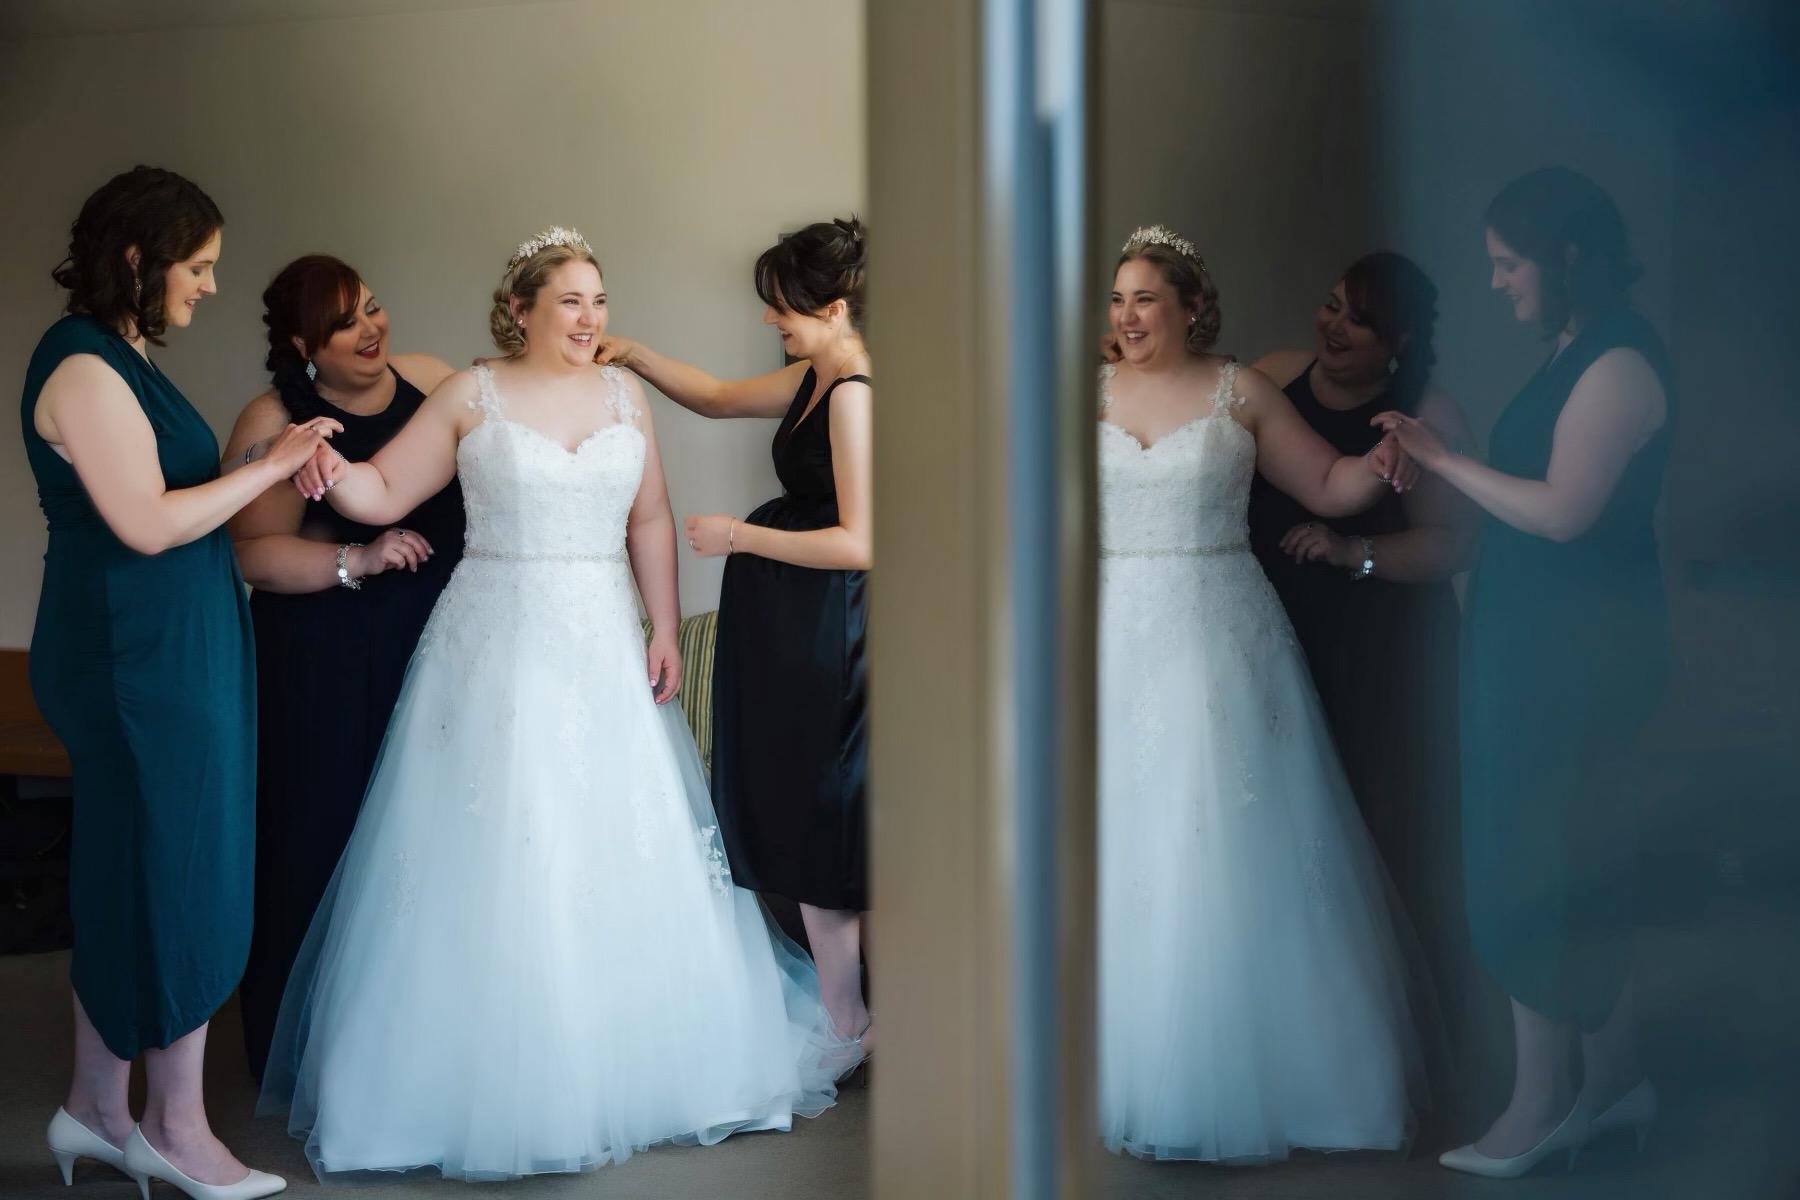 real-weddings-bride-fiona-white-dress-bridesmaids